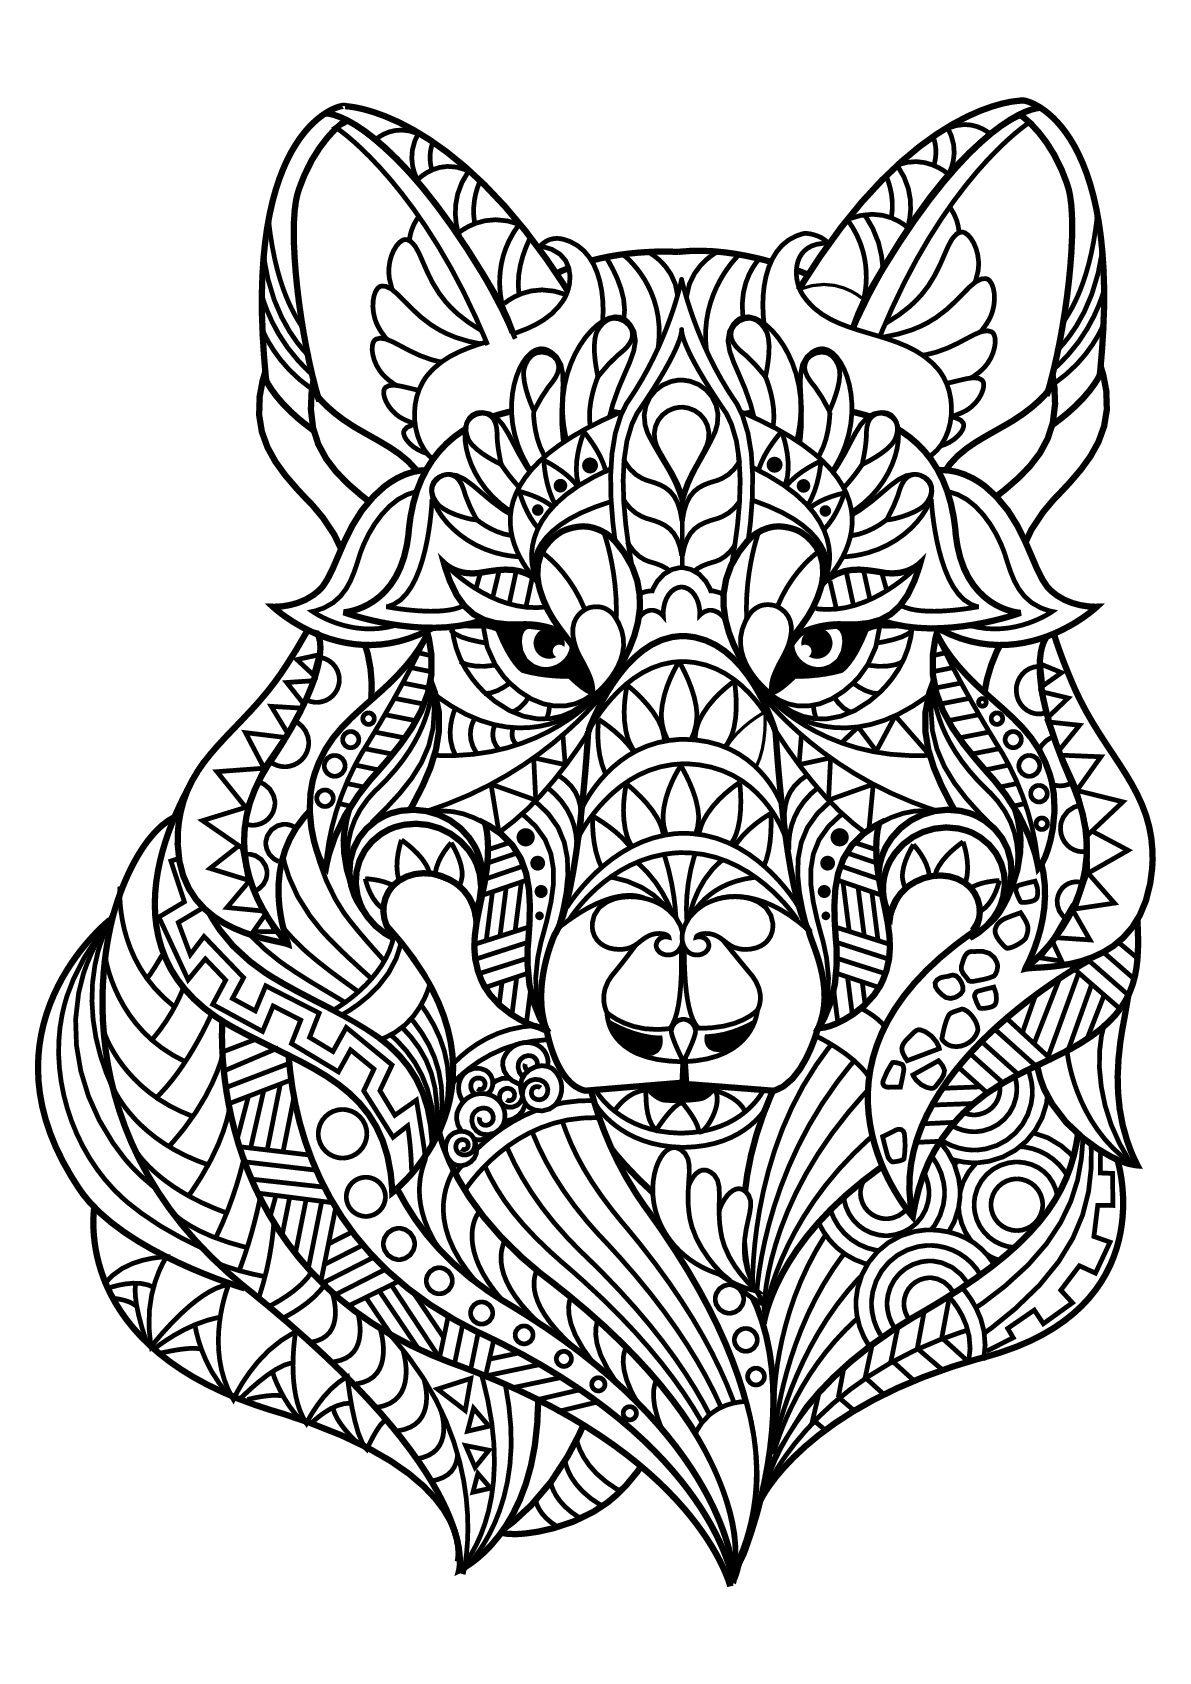 Pin By Катя On Coloring Anti Stress Раскраски антистресс